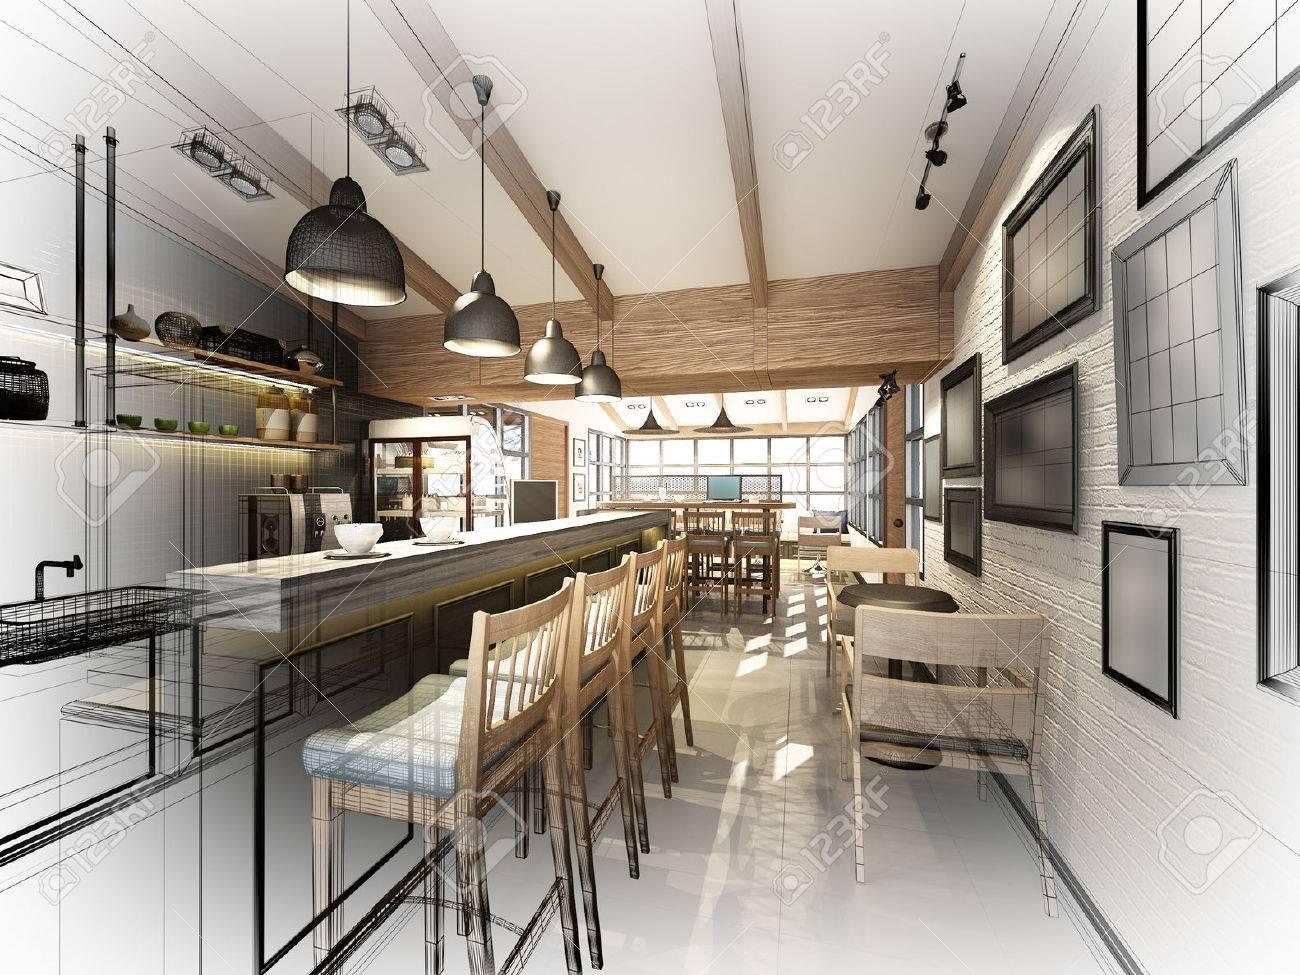 sketch design of coffee shop ,3dwire frame render - 43833233